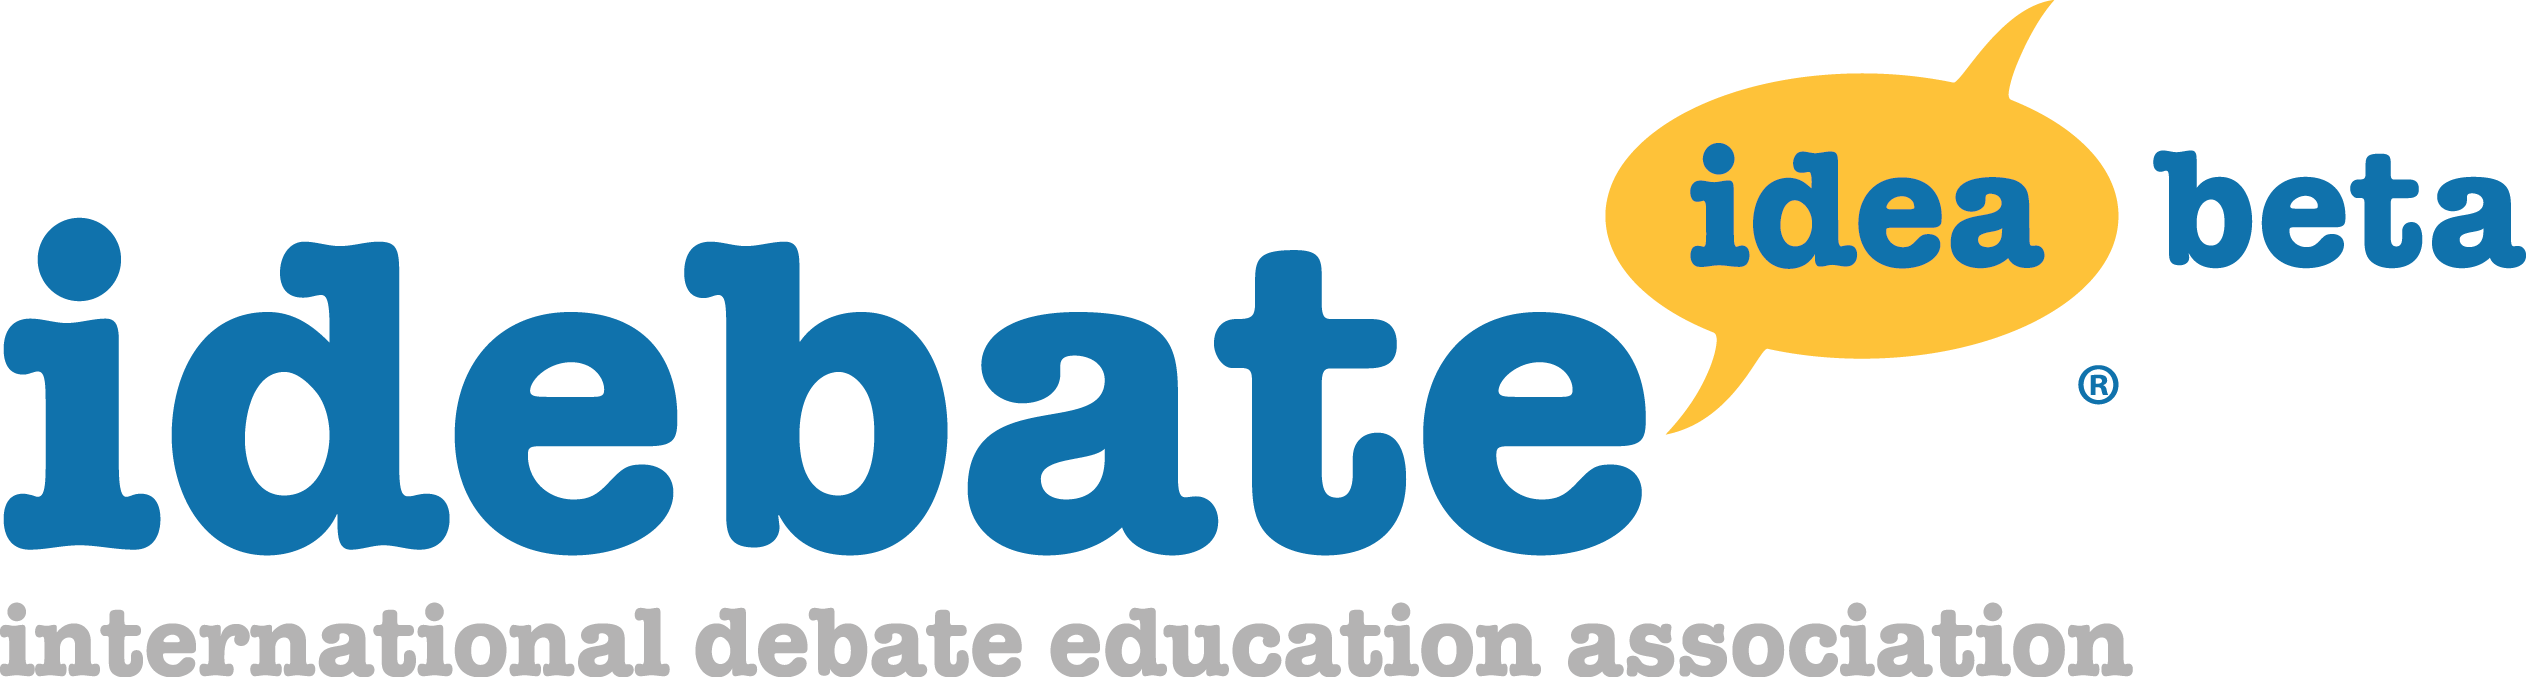 clipart transparent stock International education association idea. Conflict clipart debate competition